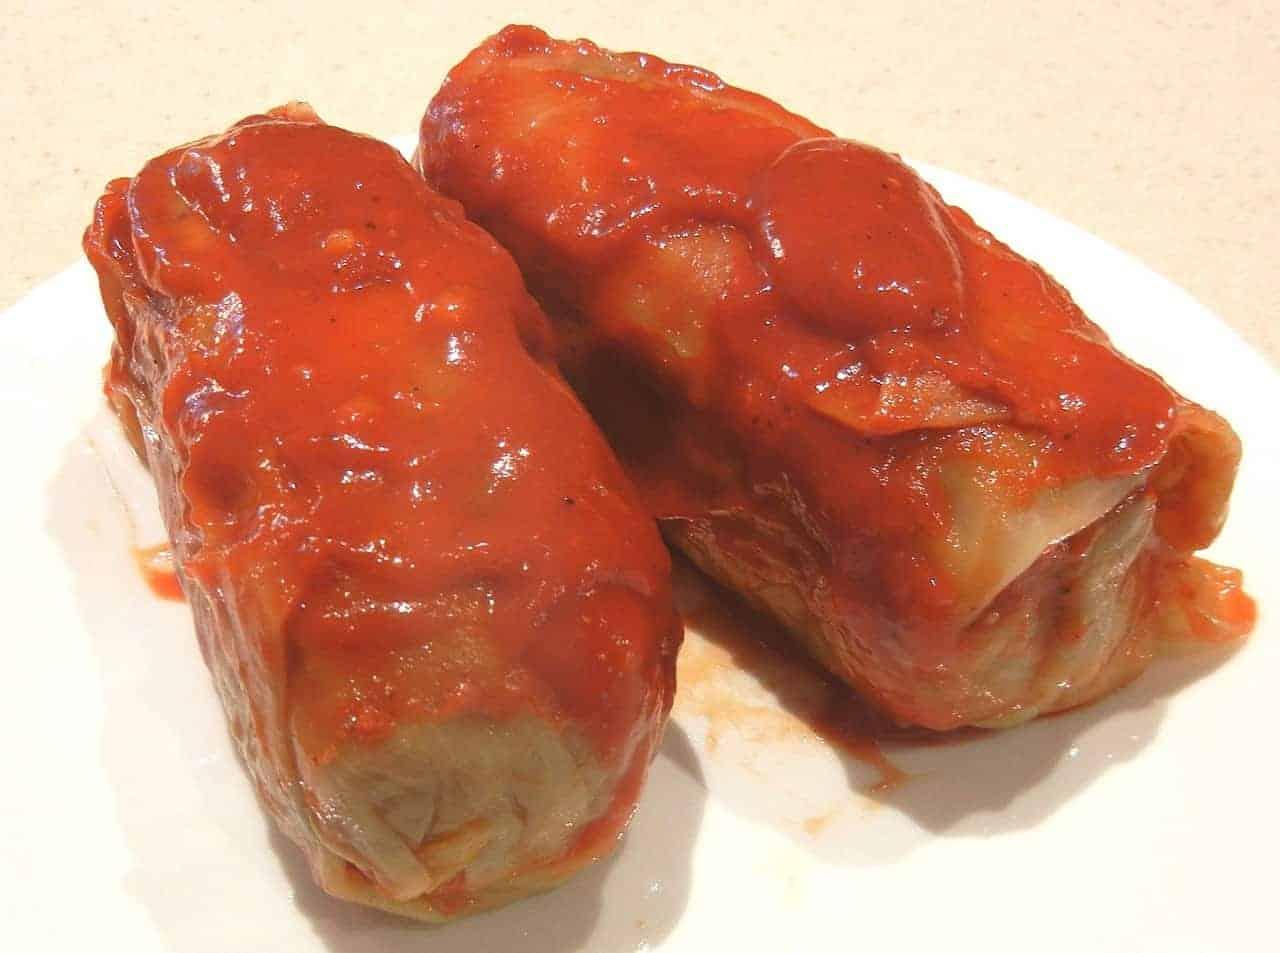 Polish golabki stuffed cabbage rolls with sauce on top.